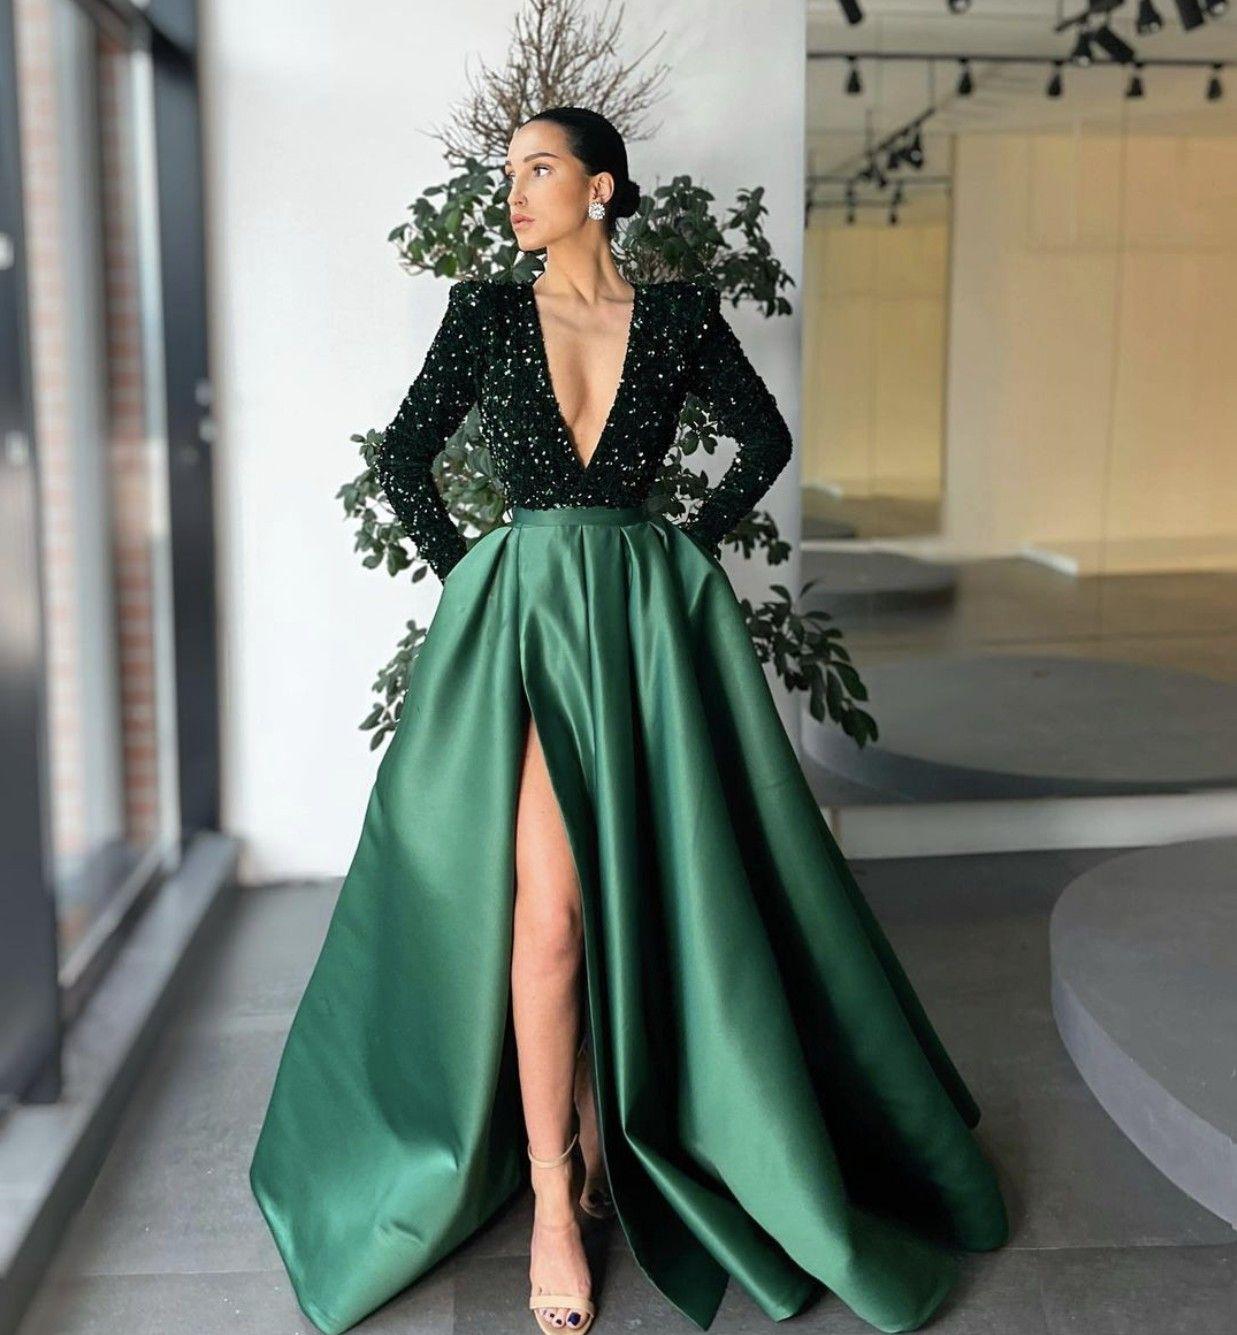 2021 dunkelgrüne elegante abendkleider mit langarm dubai arabic pailletten satin prom kleid party kleid tiefer v-neck hohe split